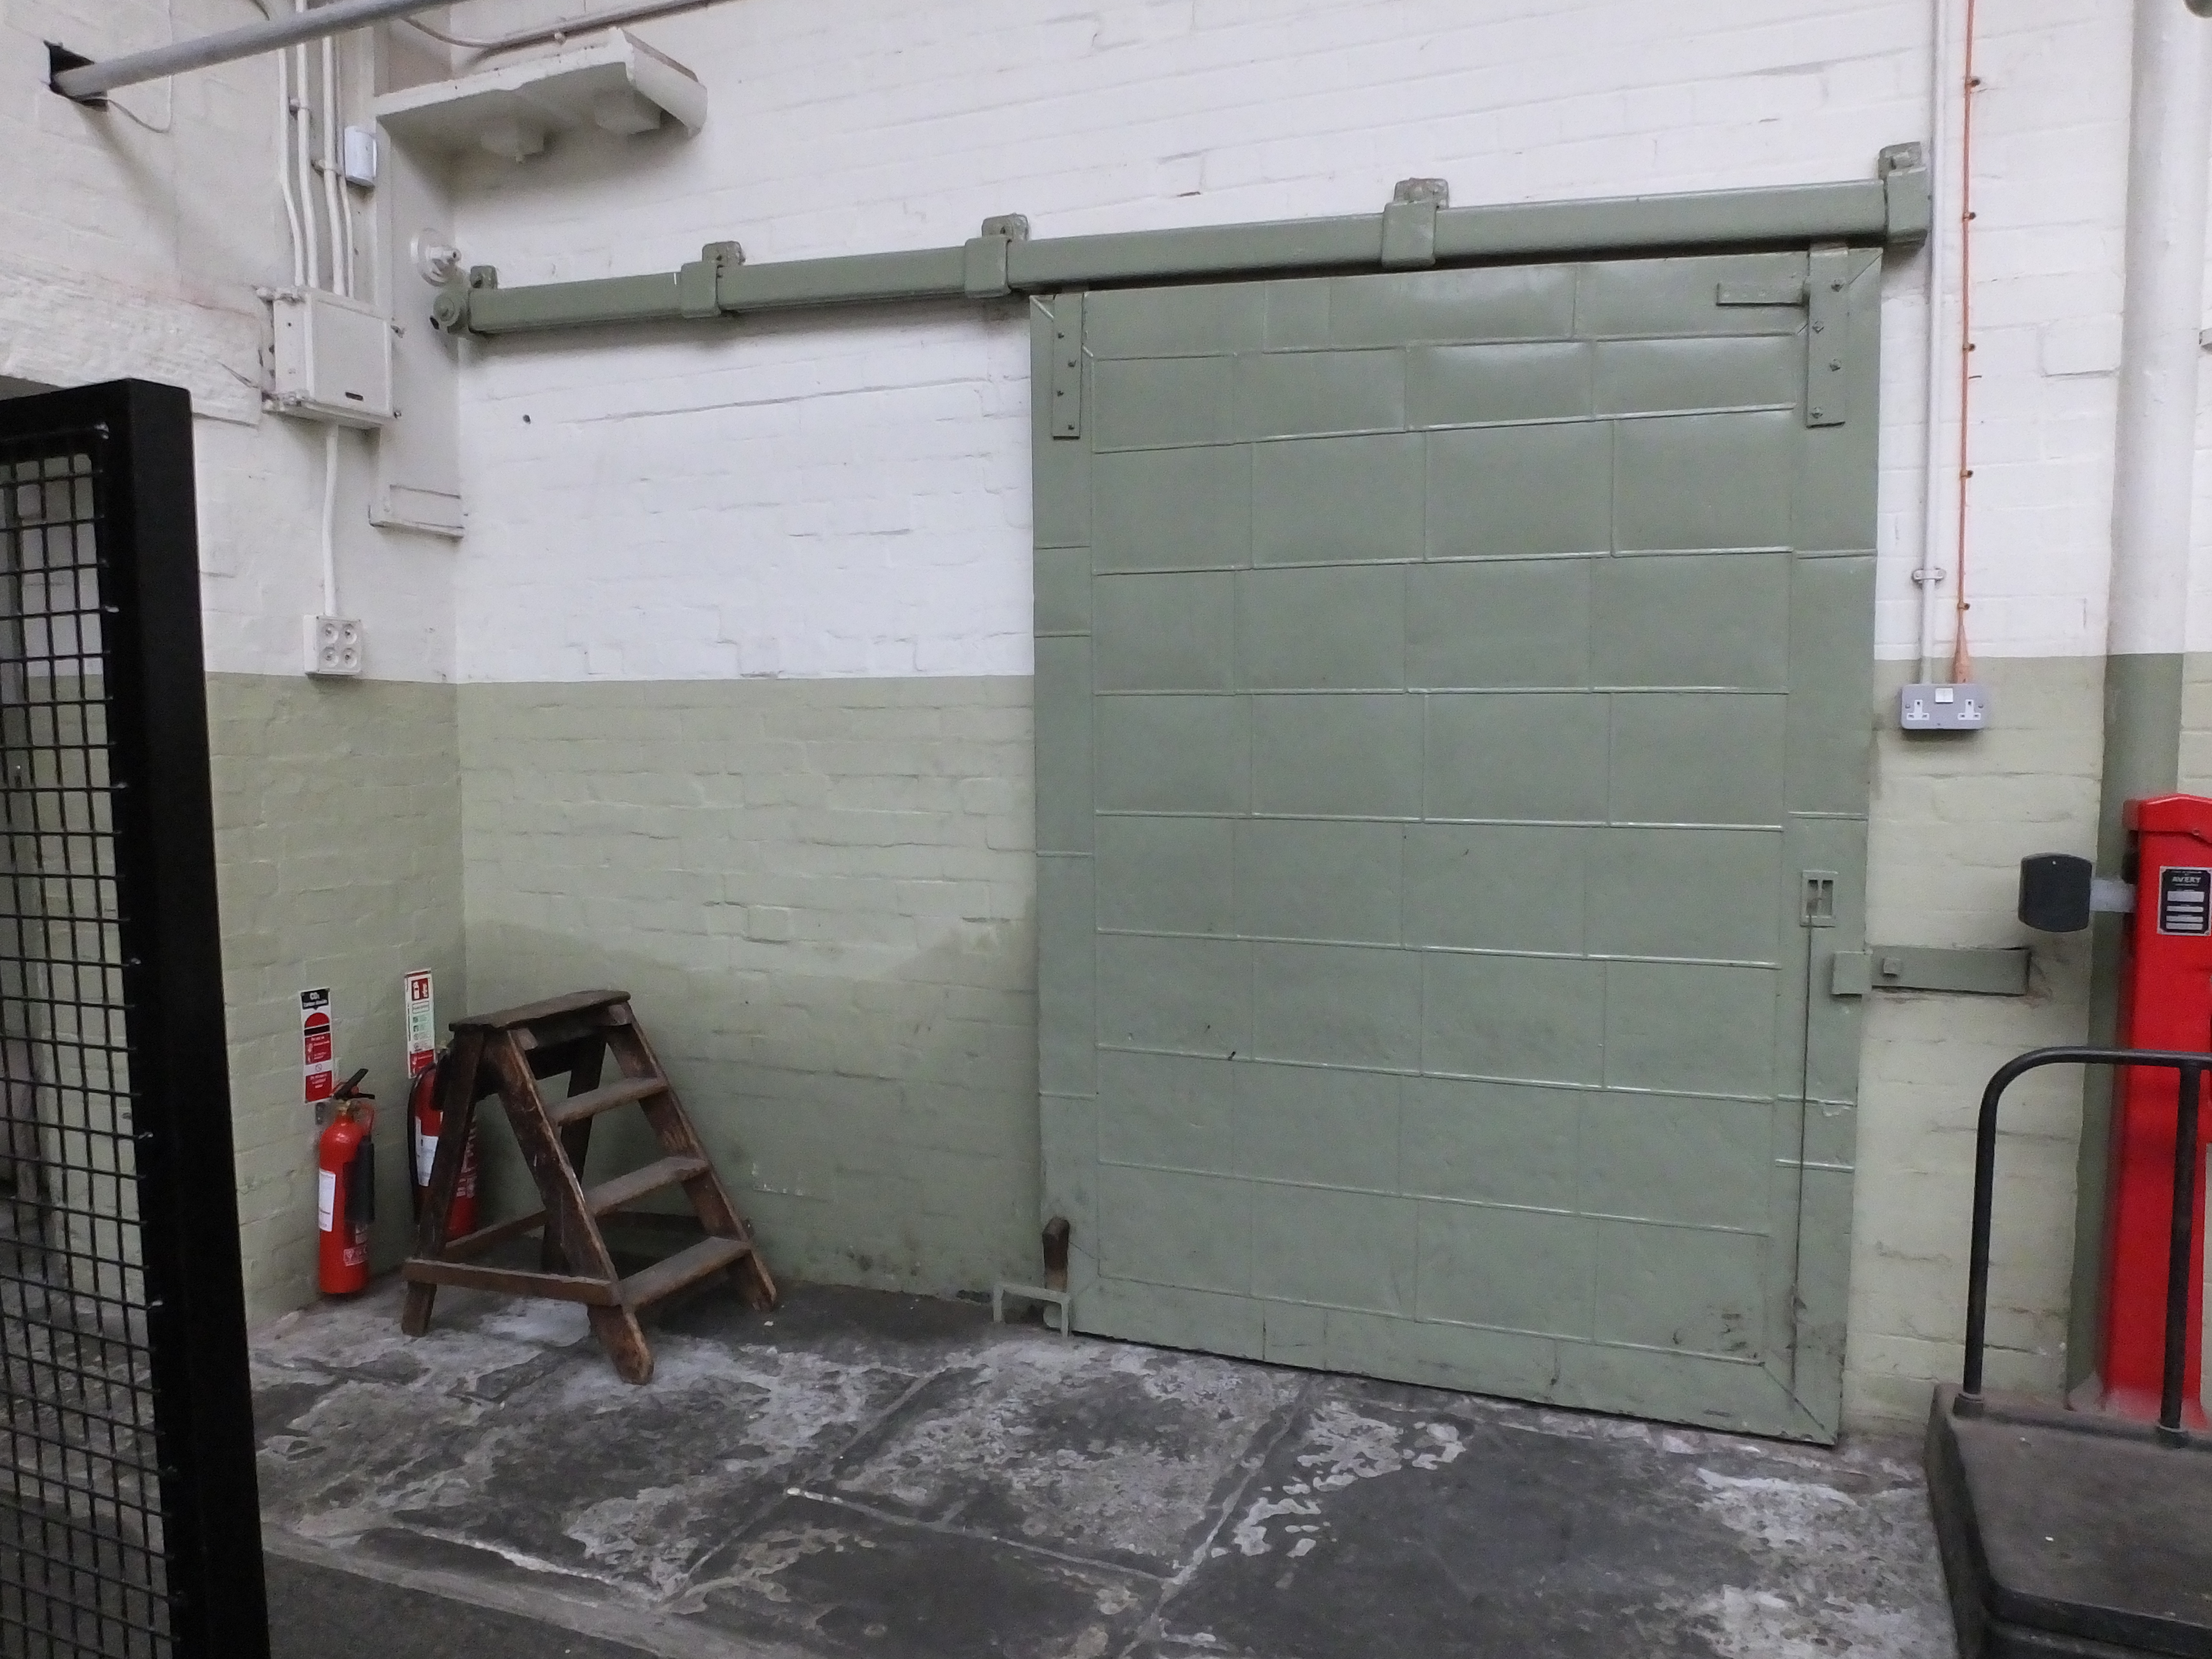 FileQueen Street Mill self closing fire-door 8617.JPG & File:Queen Street Mill self closing fire-door 8617.JPG - Wikimedia ...